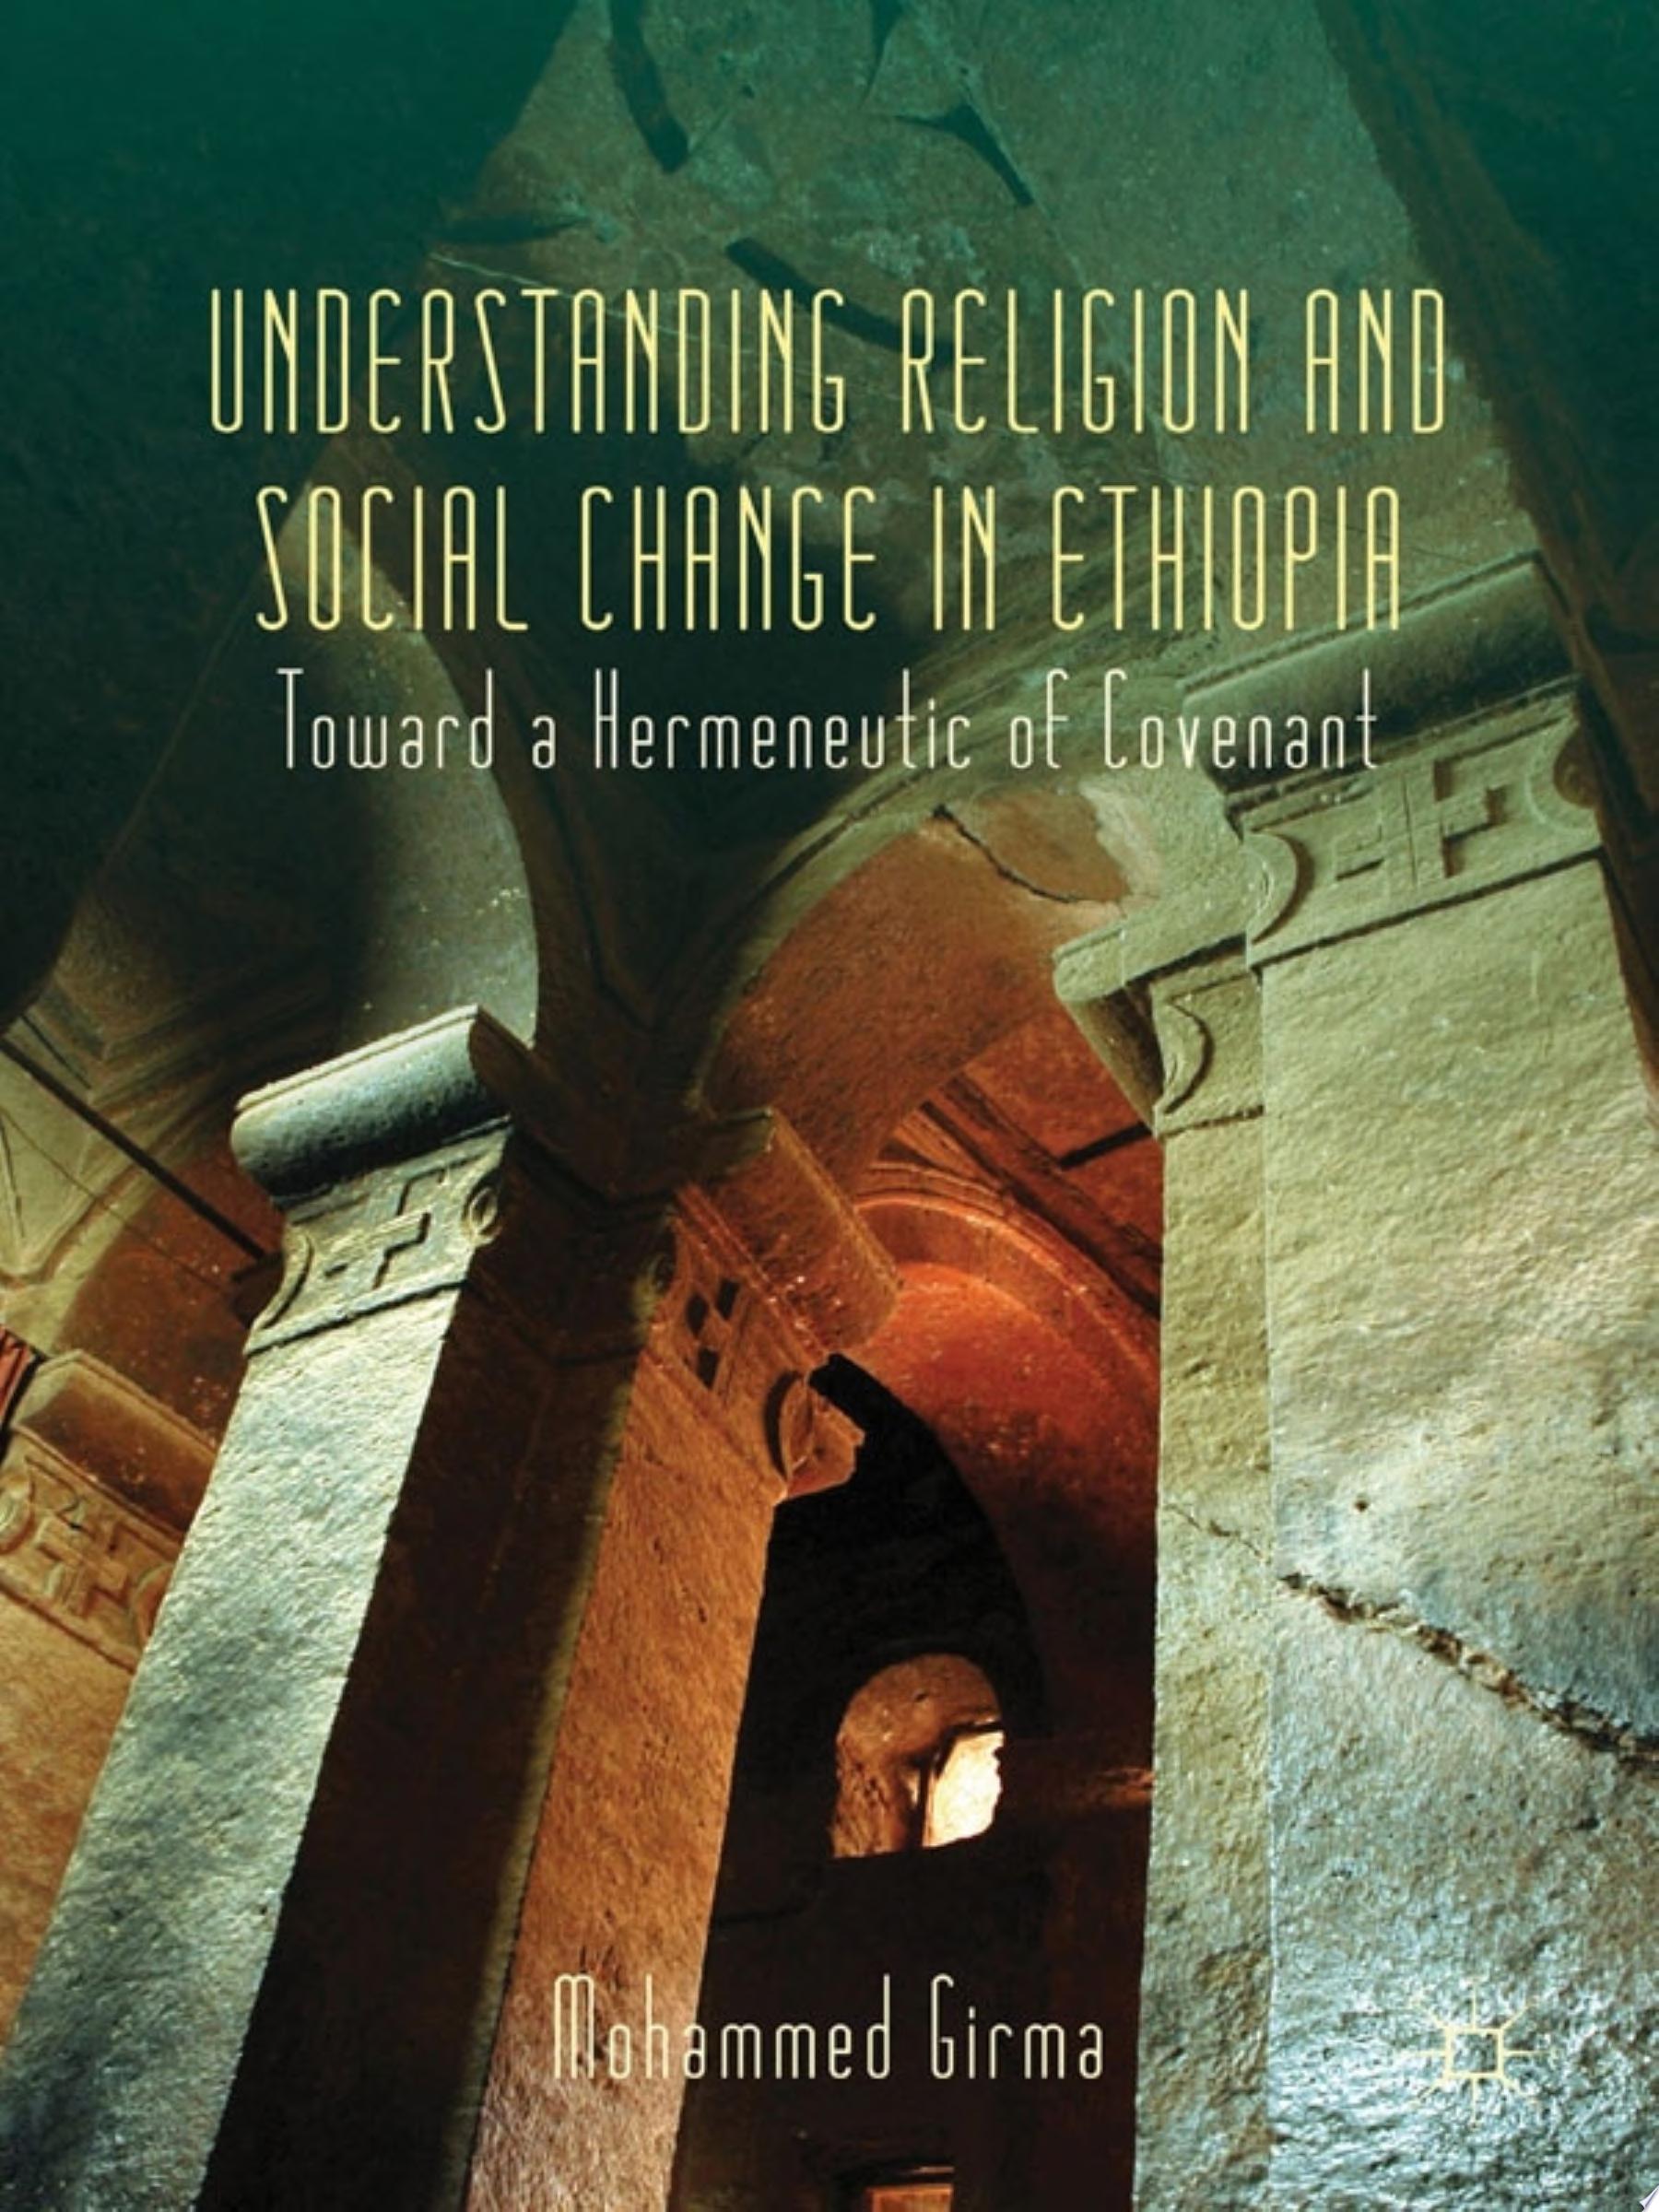 Understanding Religion and Social Change in Ethiopia